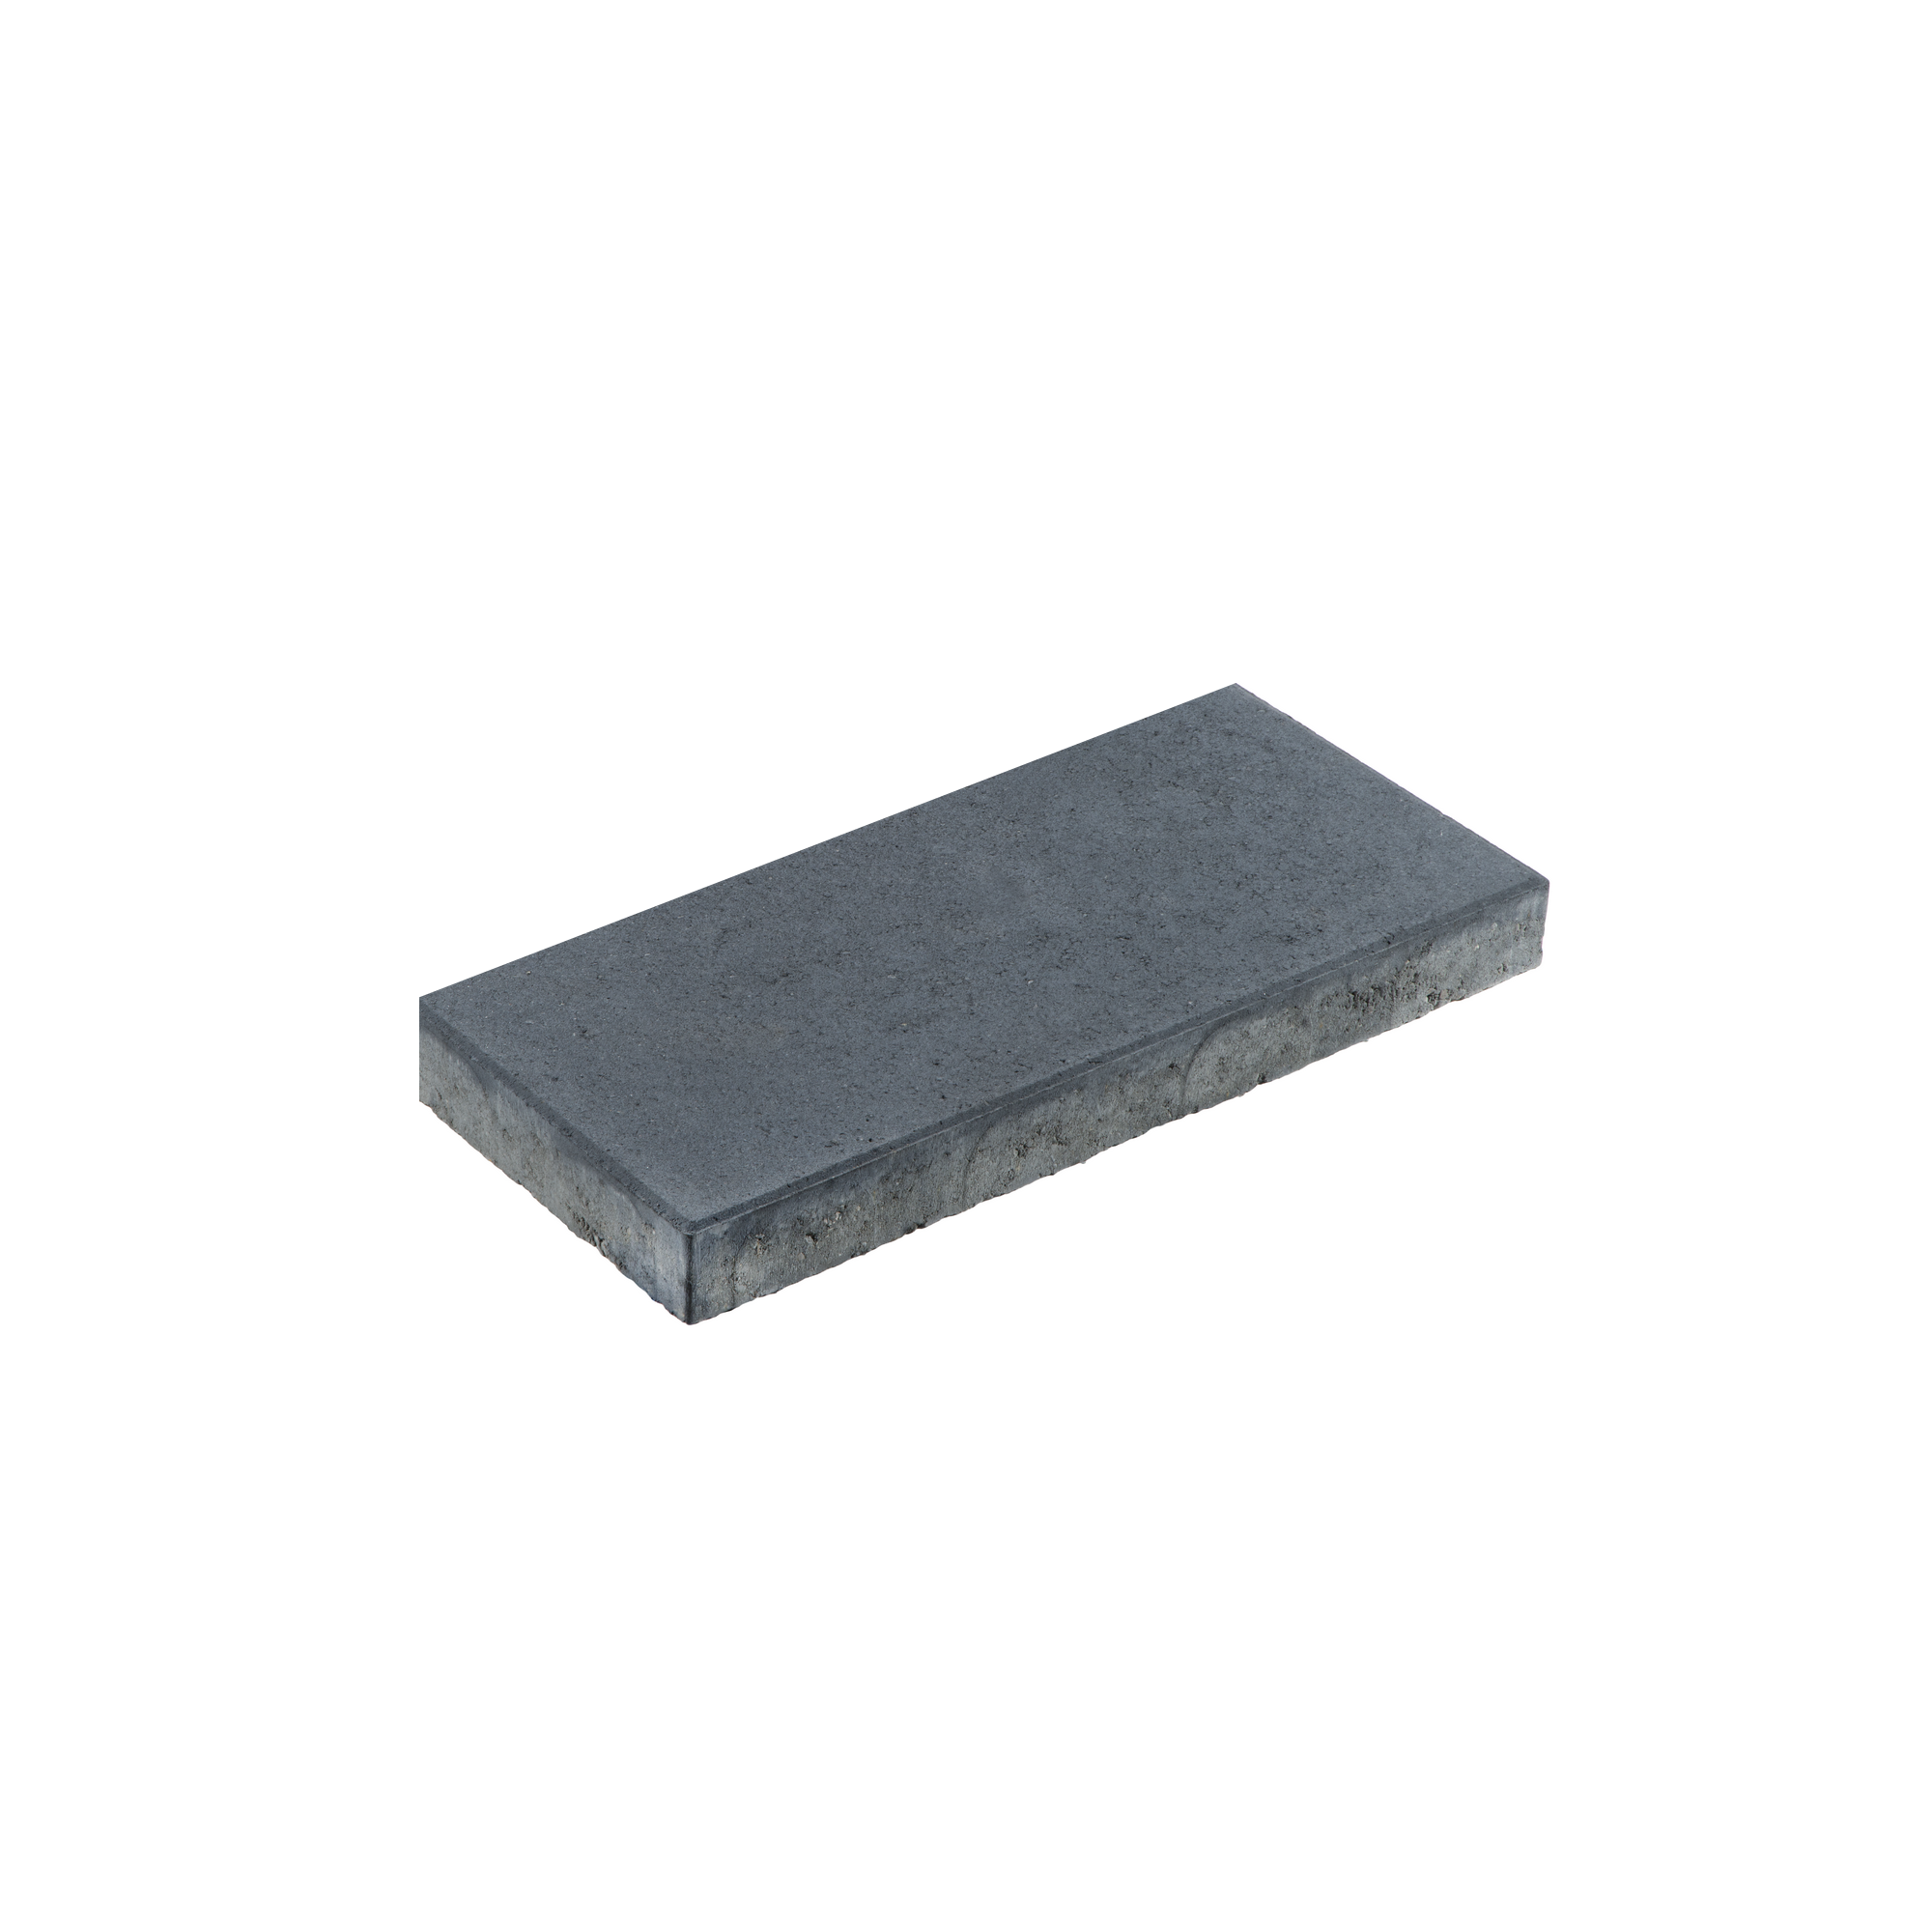 Lusit Betonplatte anthrazit 20 x 20 x 20 cm